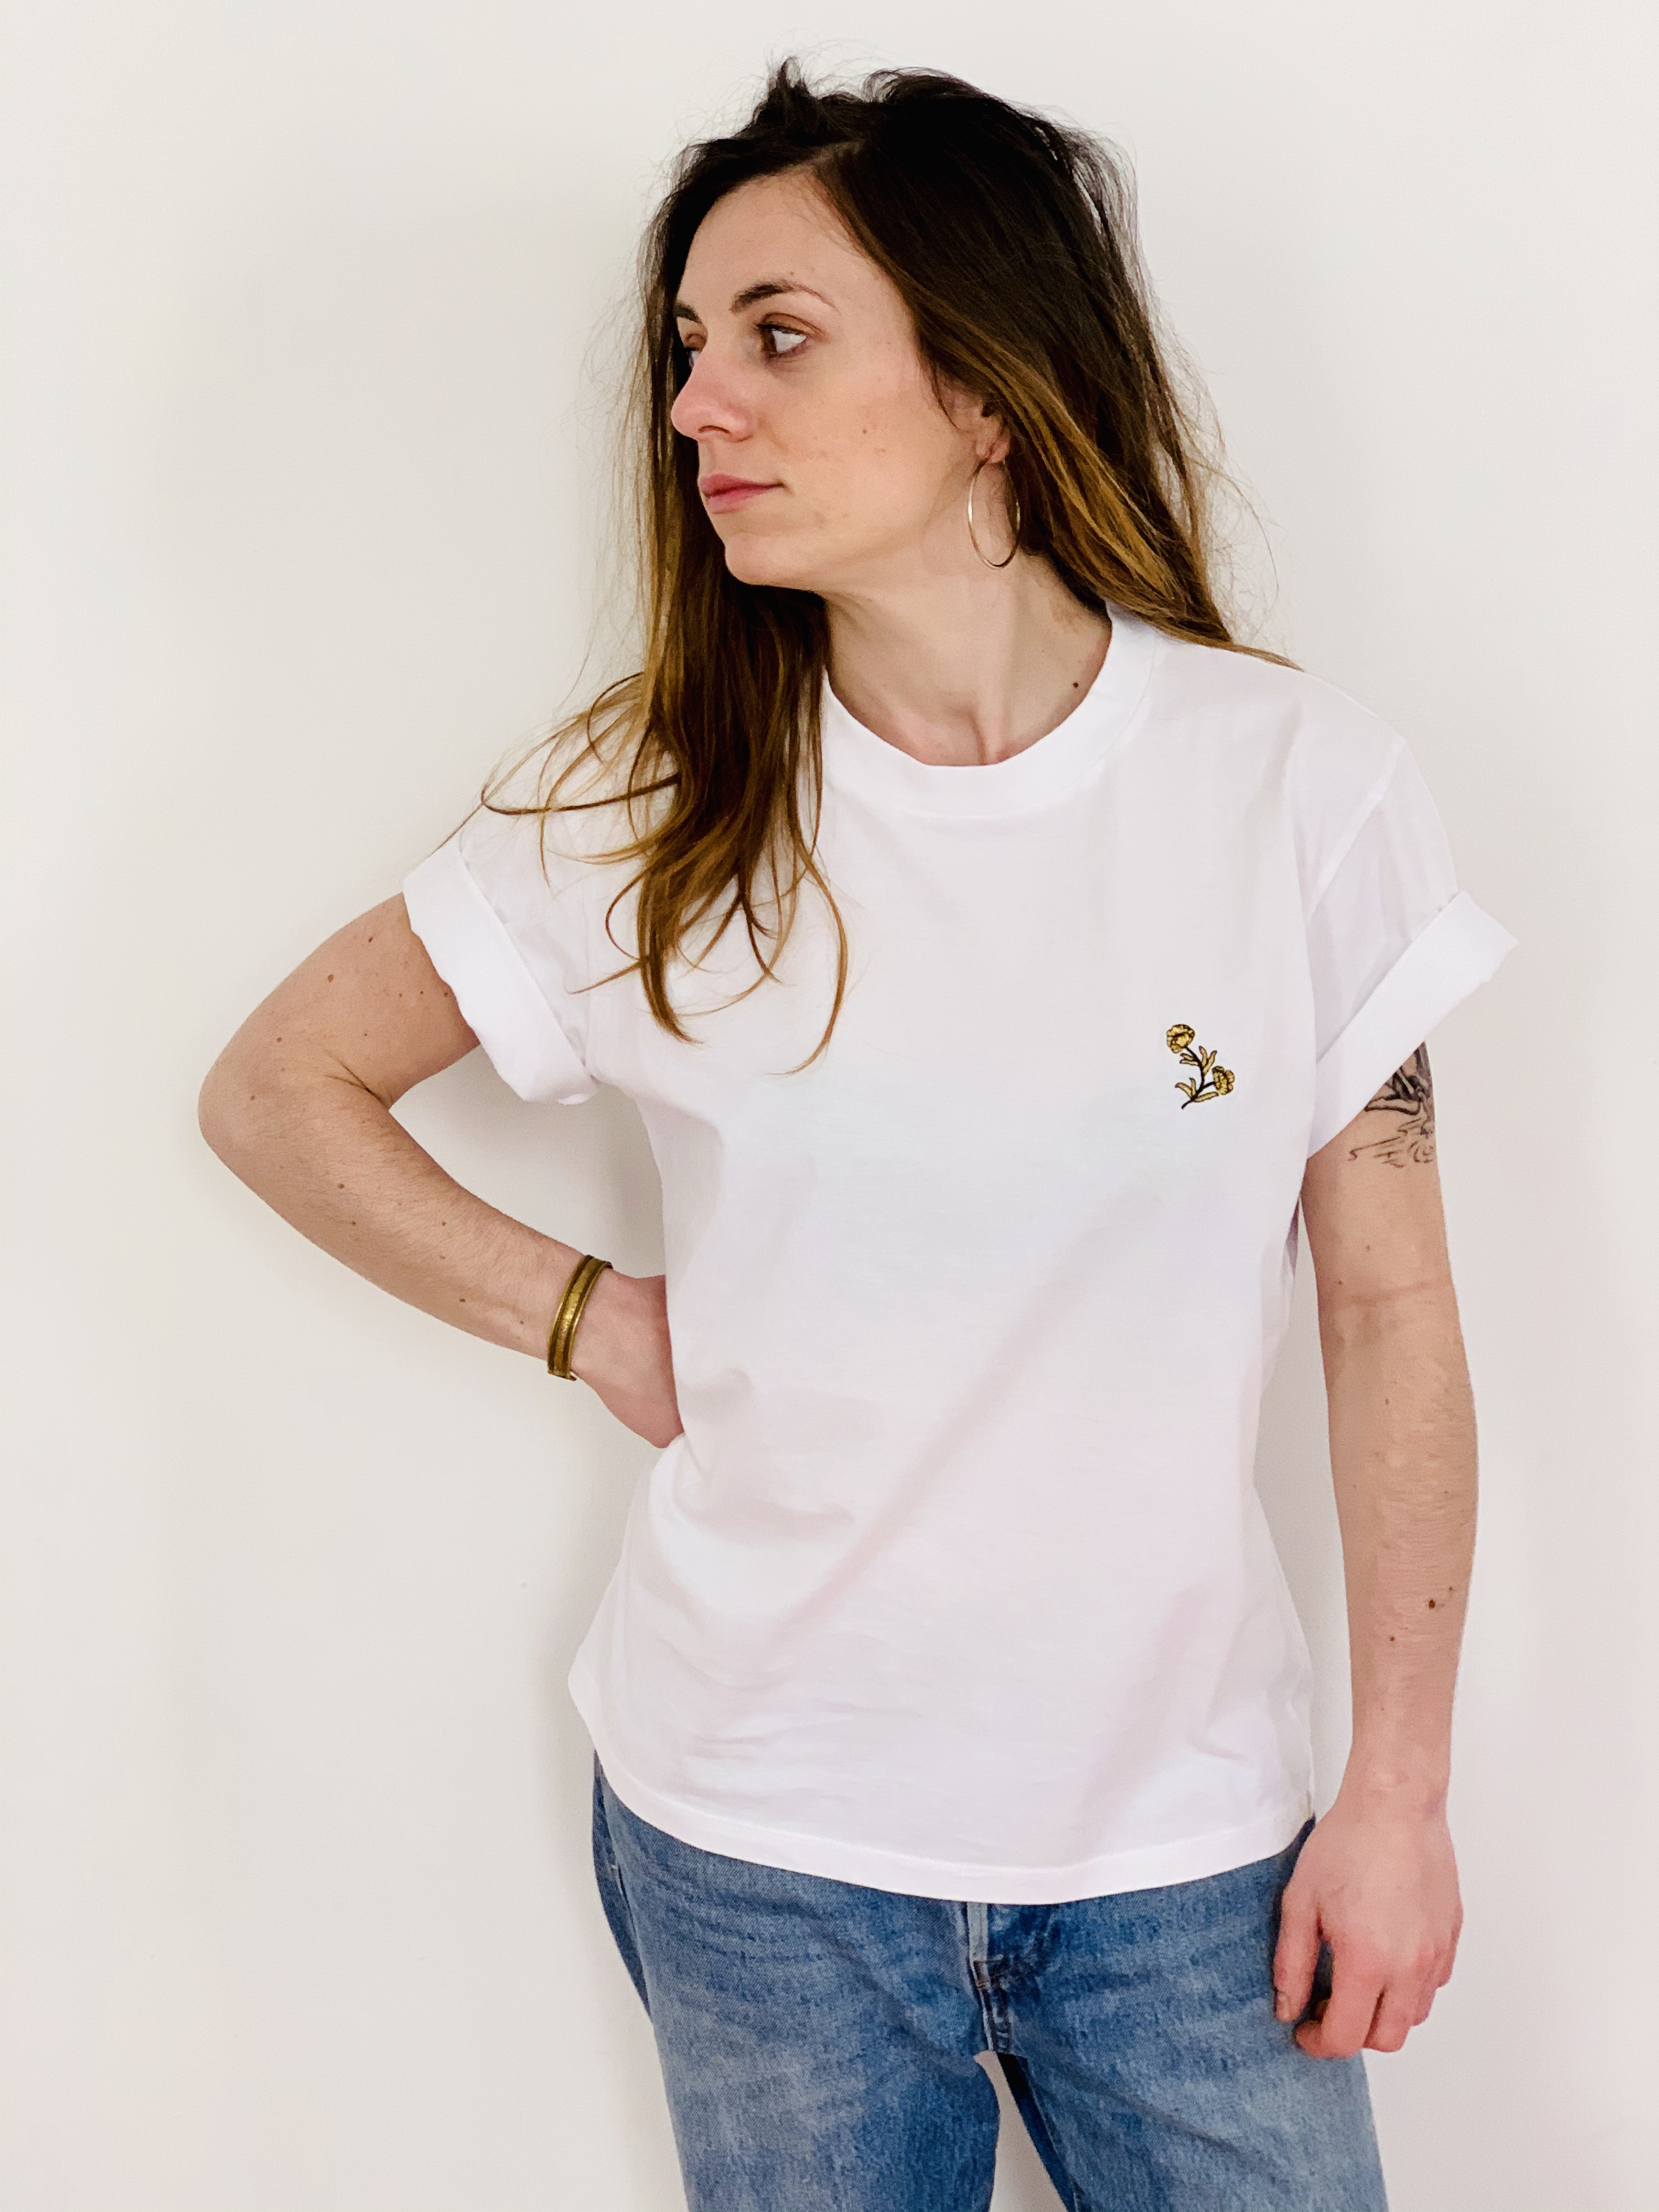 Célia Lobo - T-Shirt FLOR White - 100% Organic Cotton